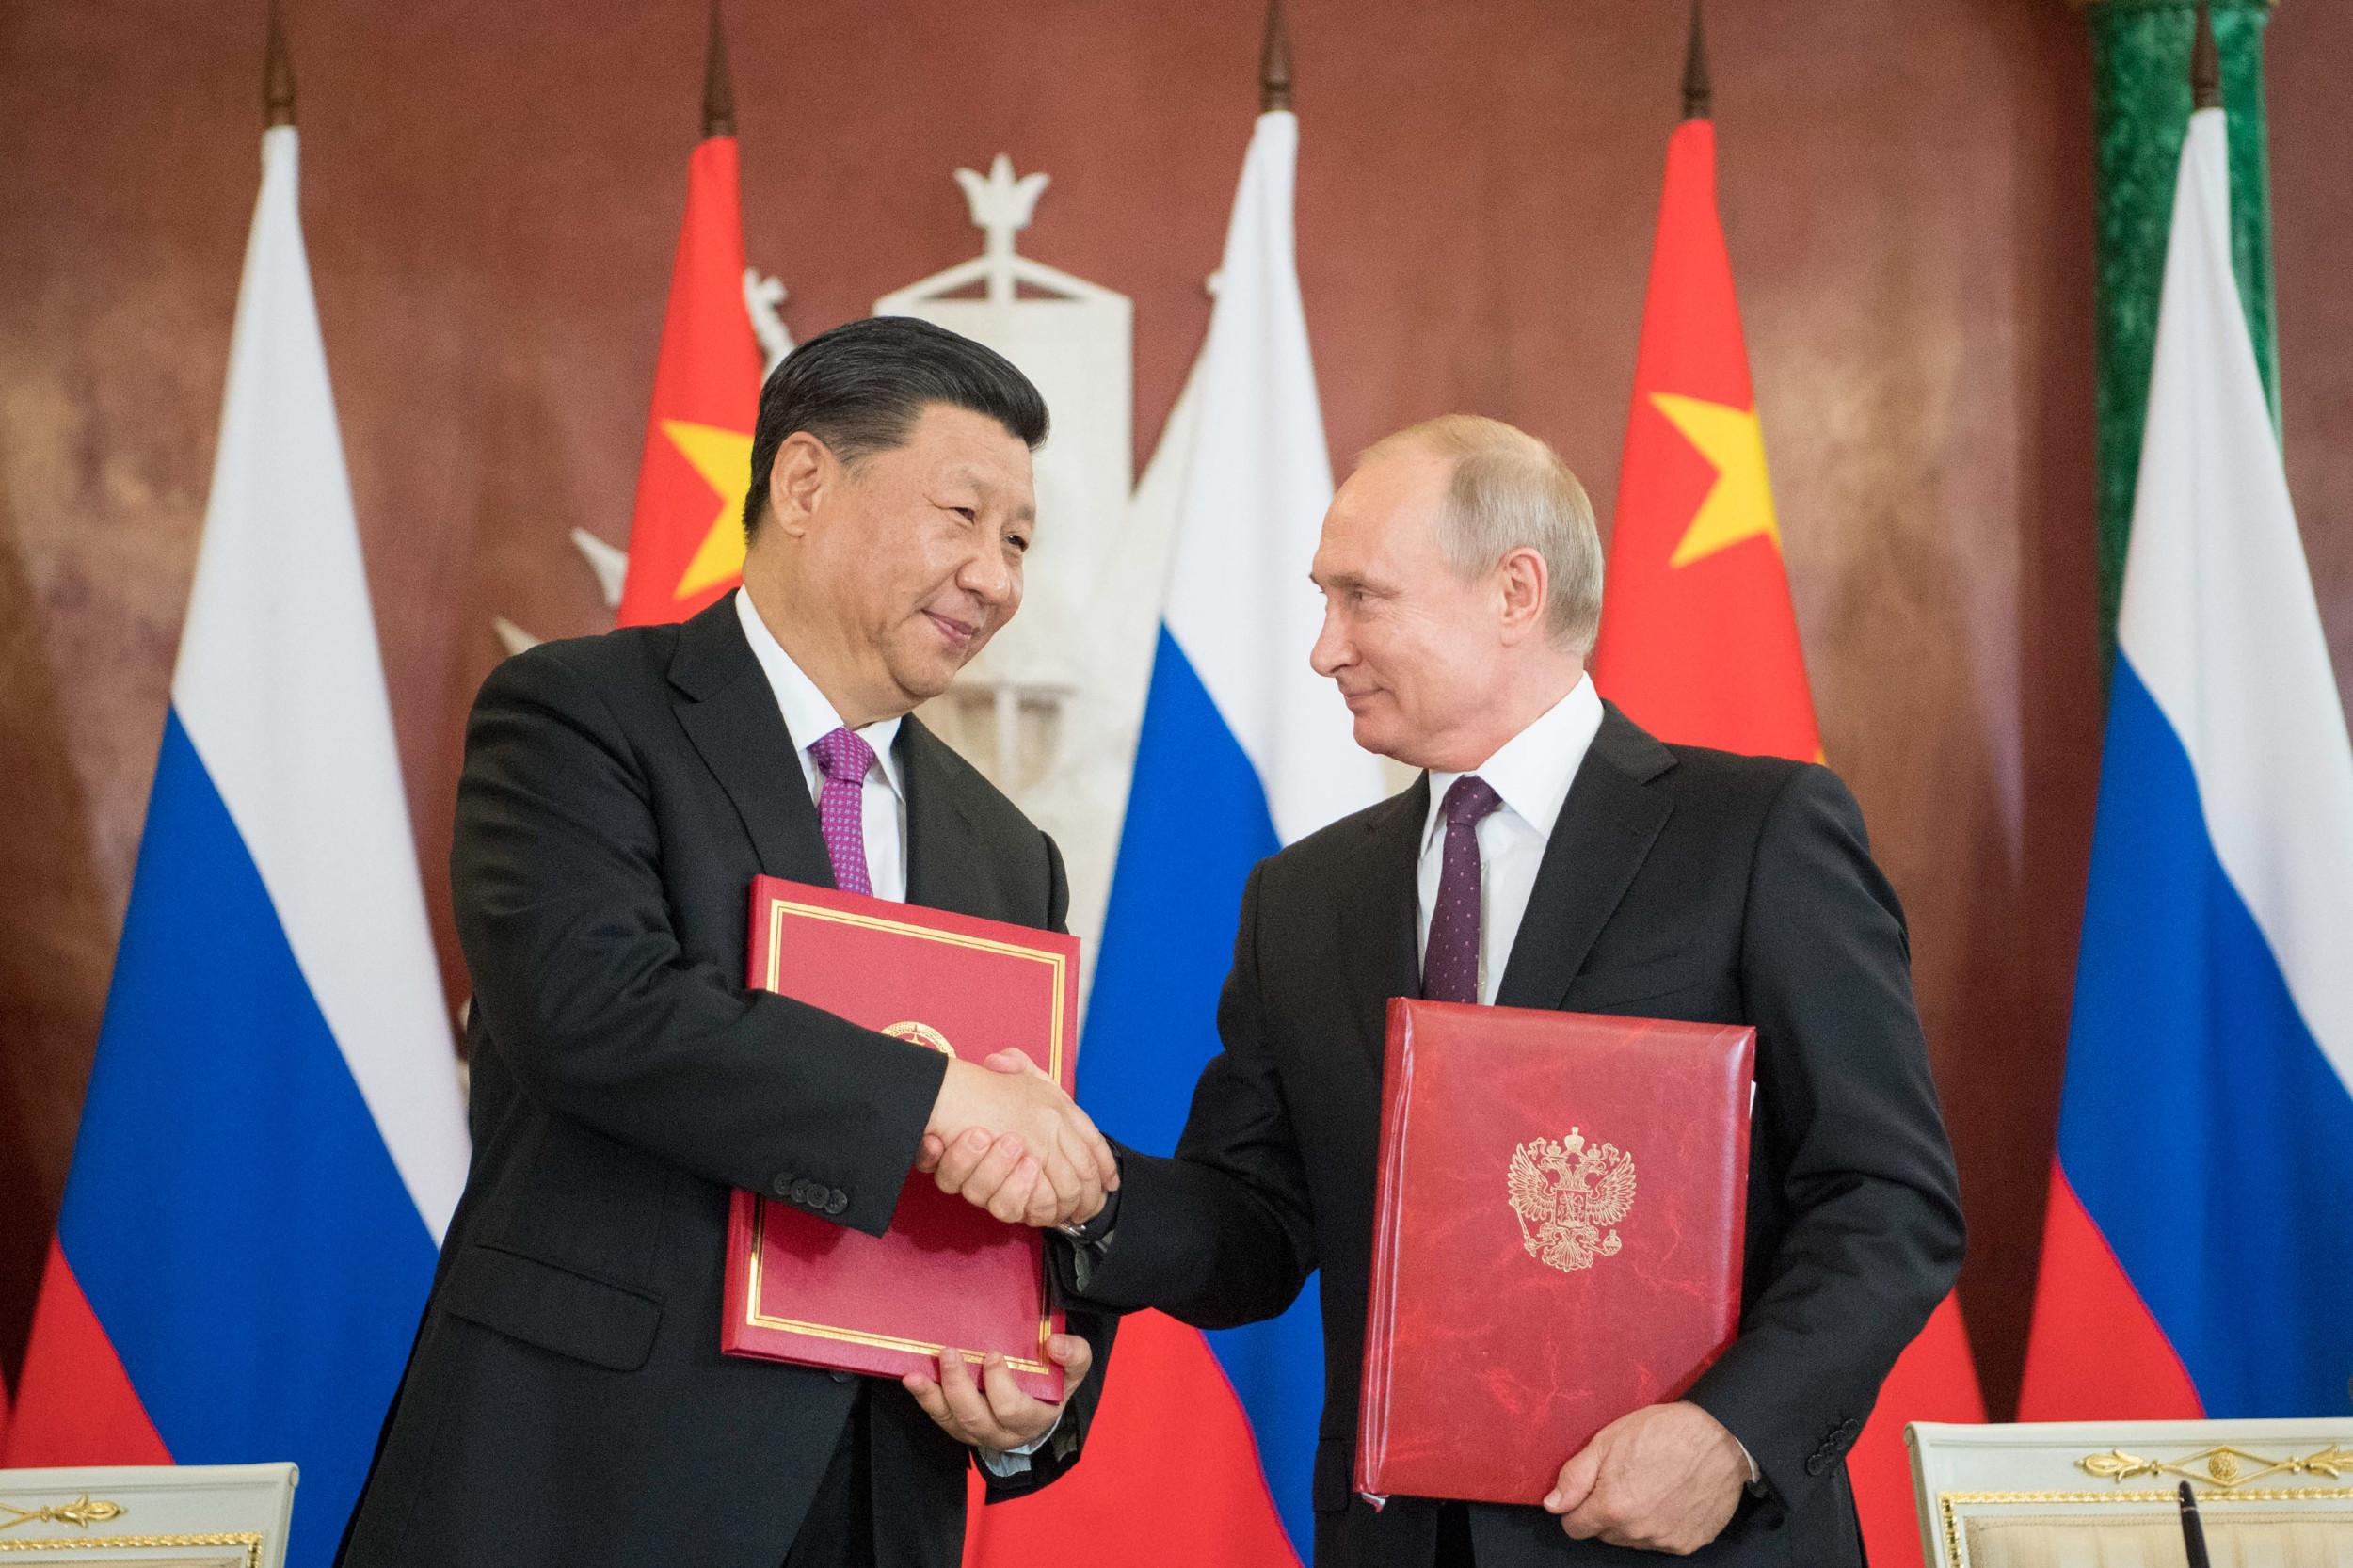 Predsednik Kine Si Đinping i predsednik Rusije Vladimir Putin se rukuju tokom sastanka u Moskvi, 05. jun 2019. (Foto: Xinhua/Li Xueren)